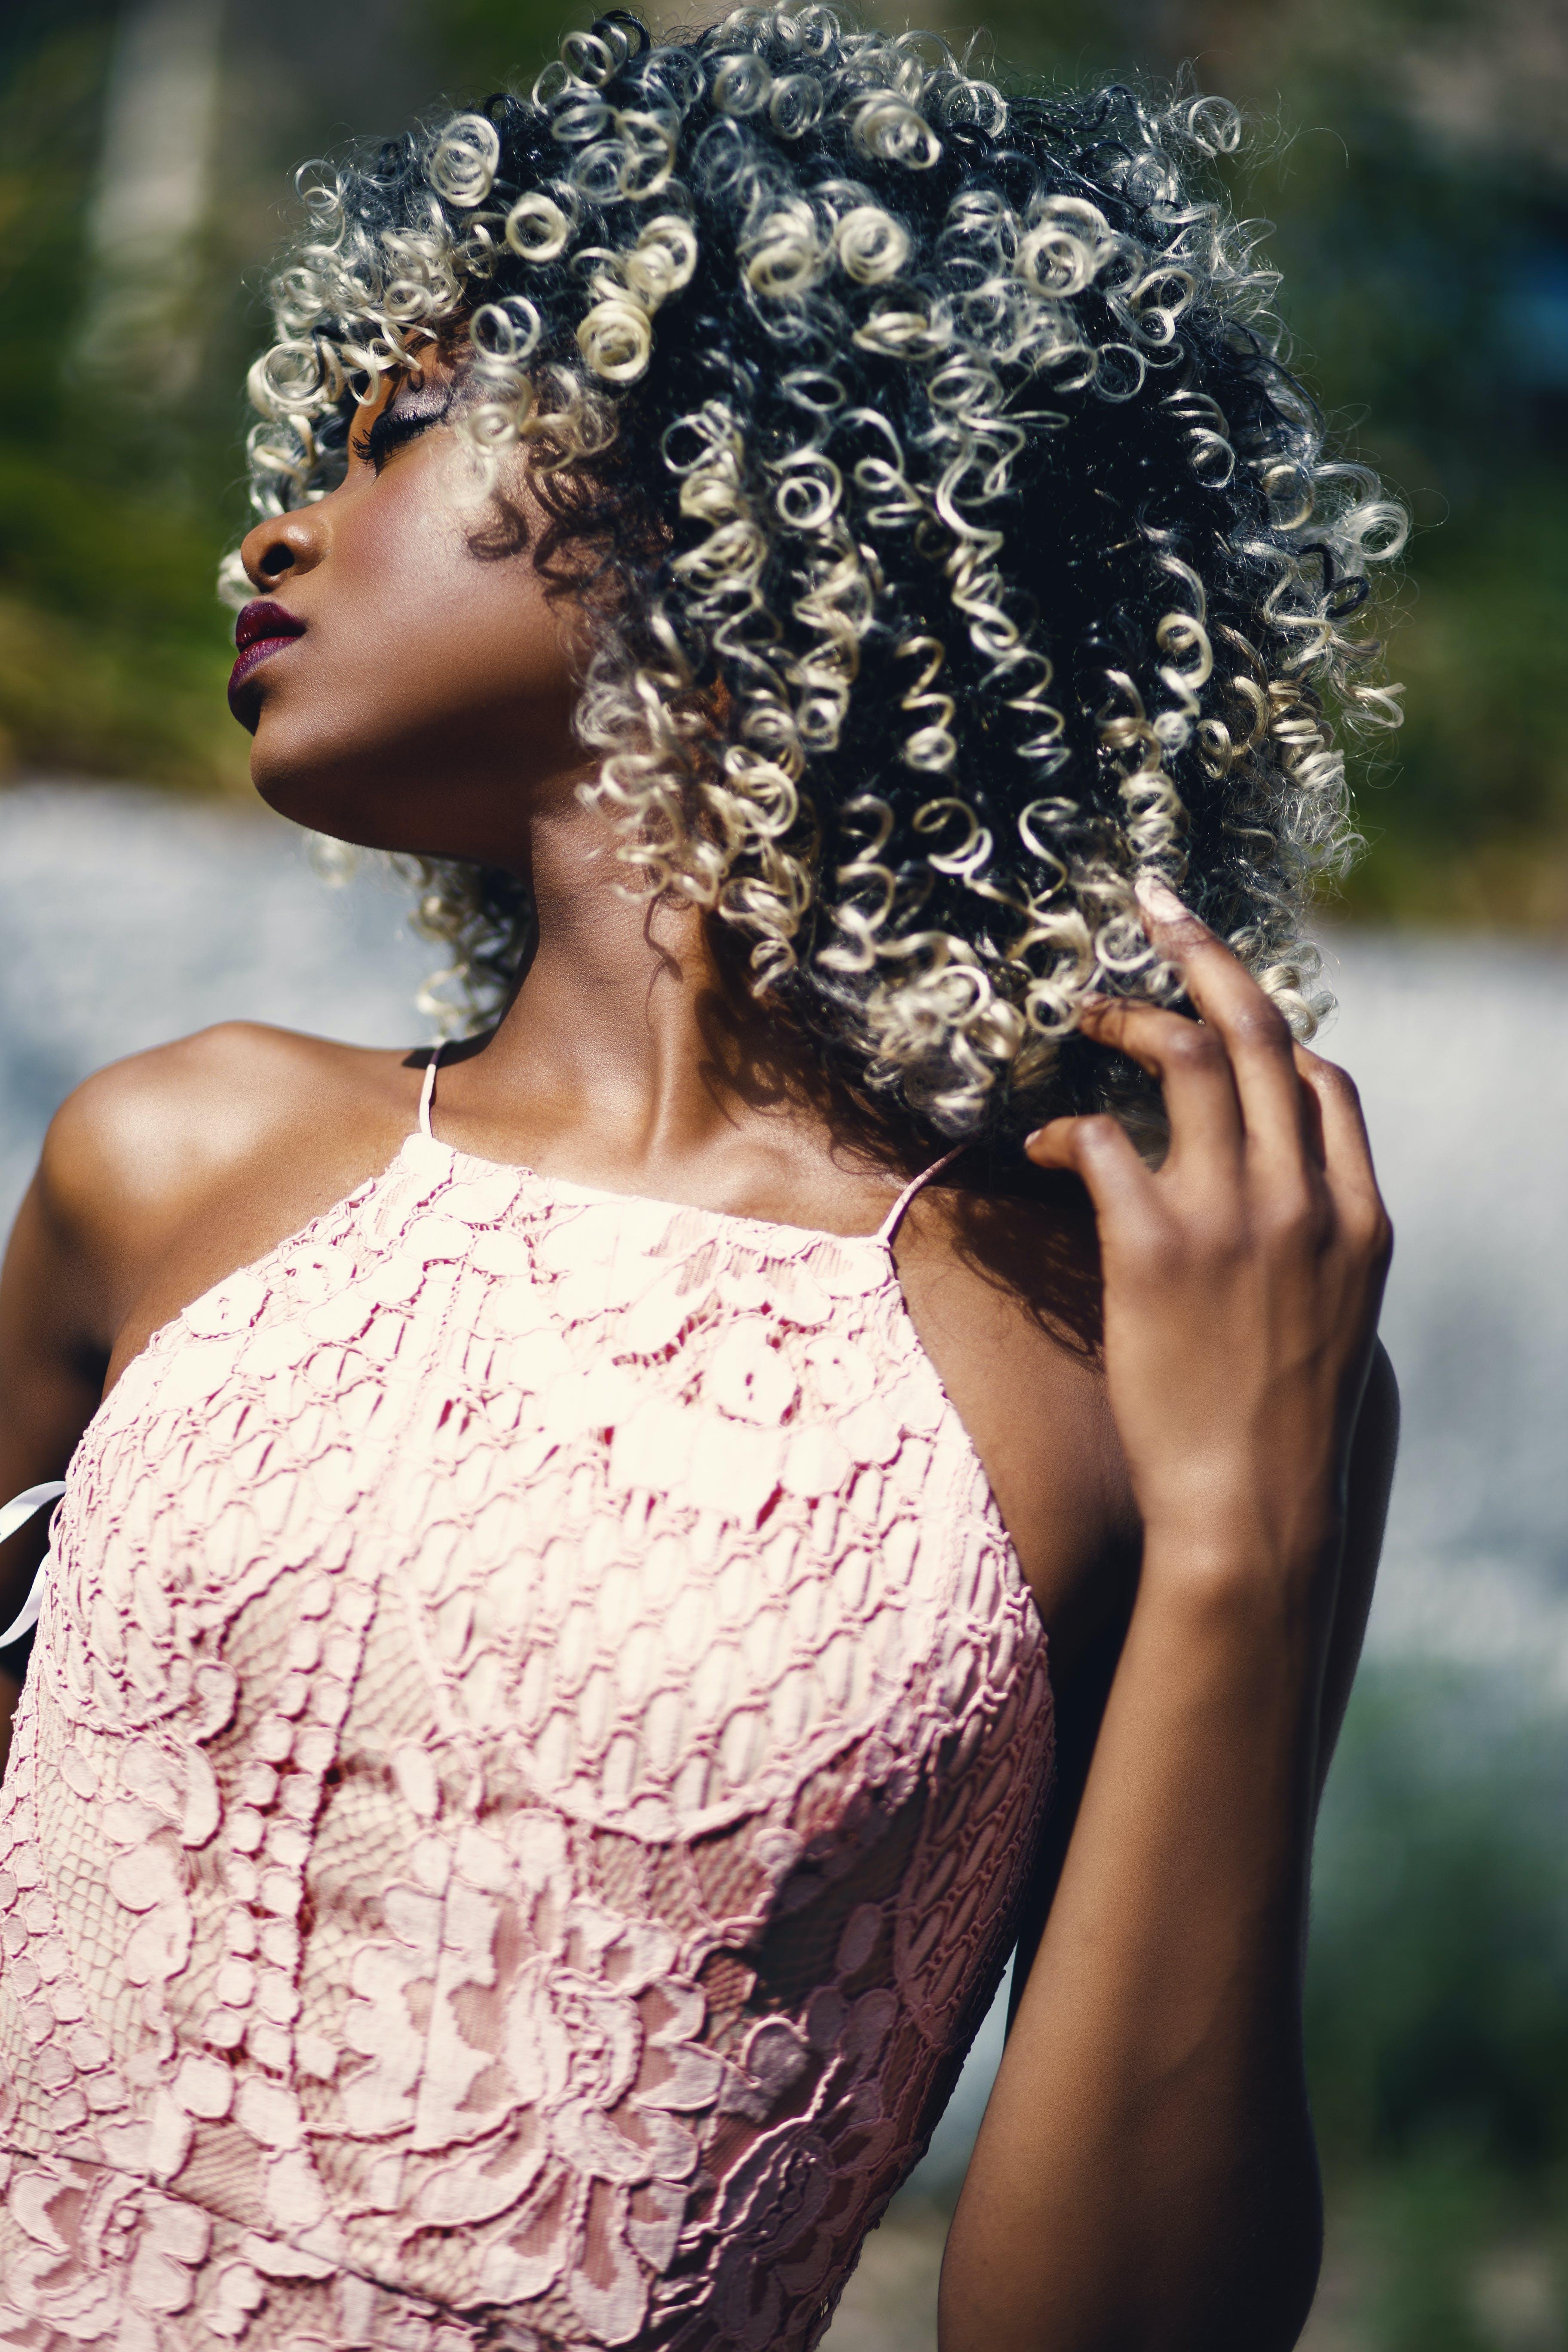 Woman Wearing 2-tone Beige Floral Spaghetti Strap Top